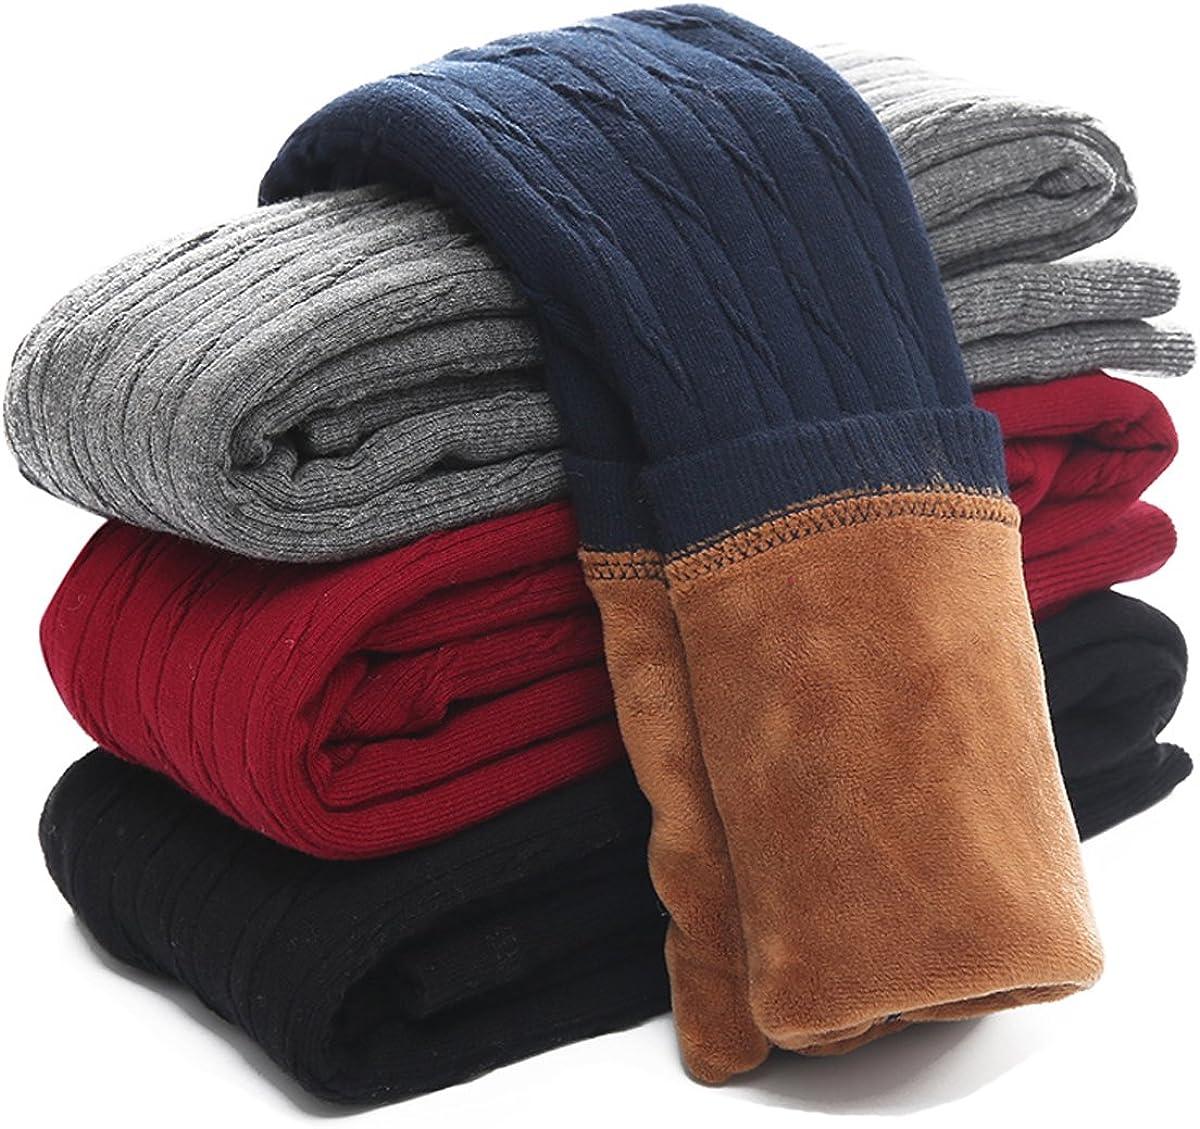 Govc Kids Girls Winter Warm Velvet Leggings Stretch Cotton Cable Knit Fleece Lined Pants Tights